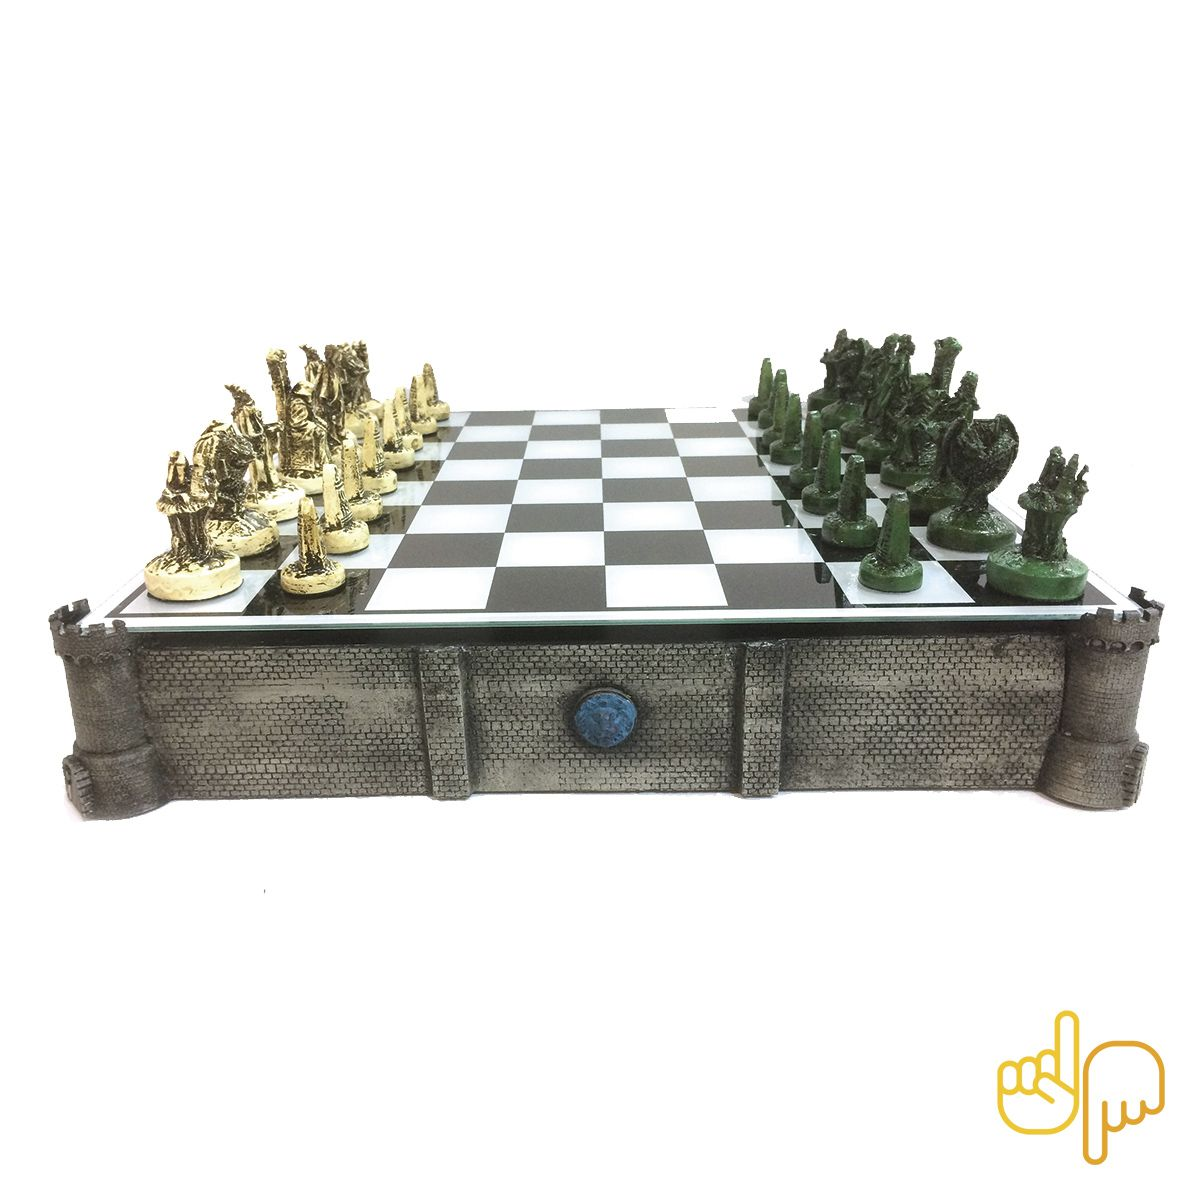 Tabuleiro de Xadrez Nerd Castelo de Batalha RPG 32 peças